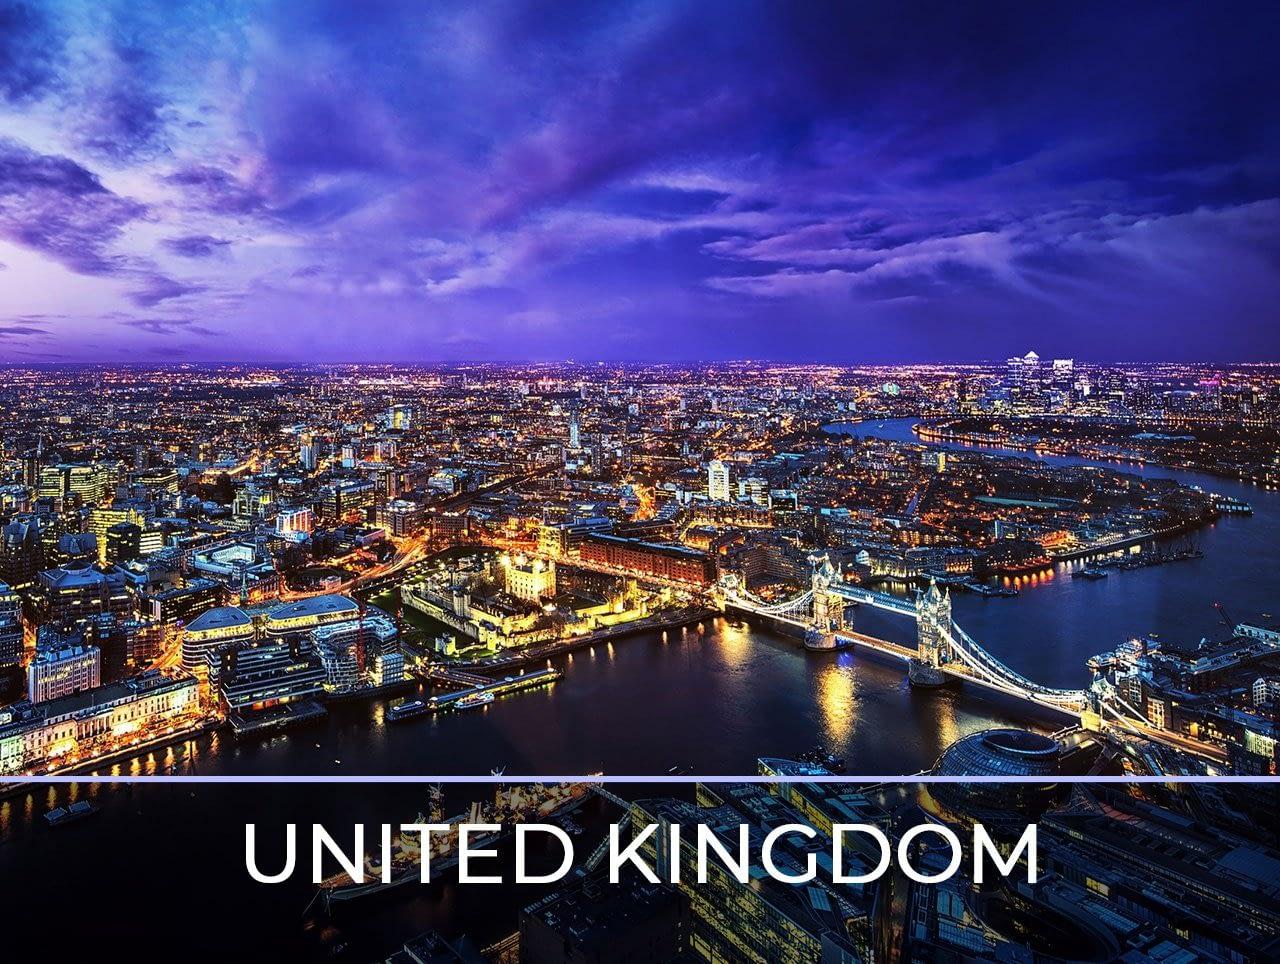 UK Entertainment website